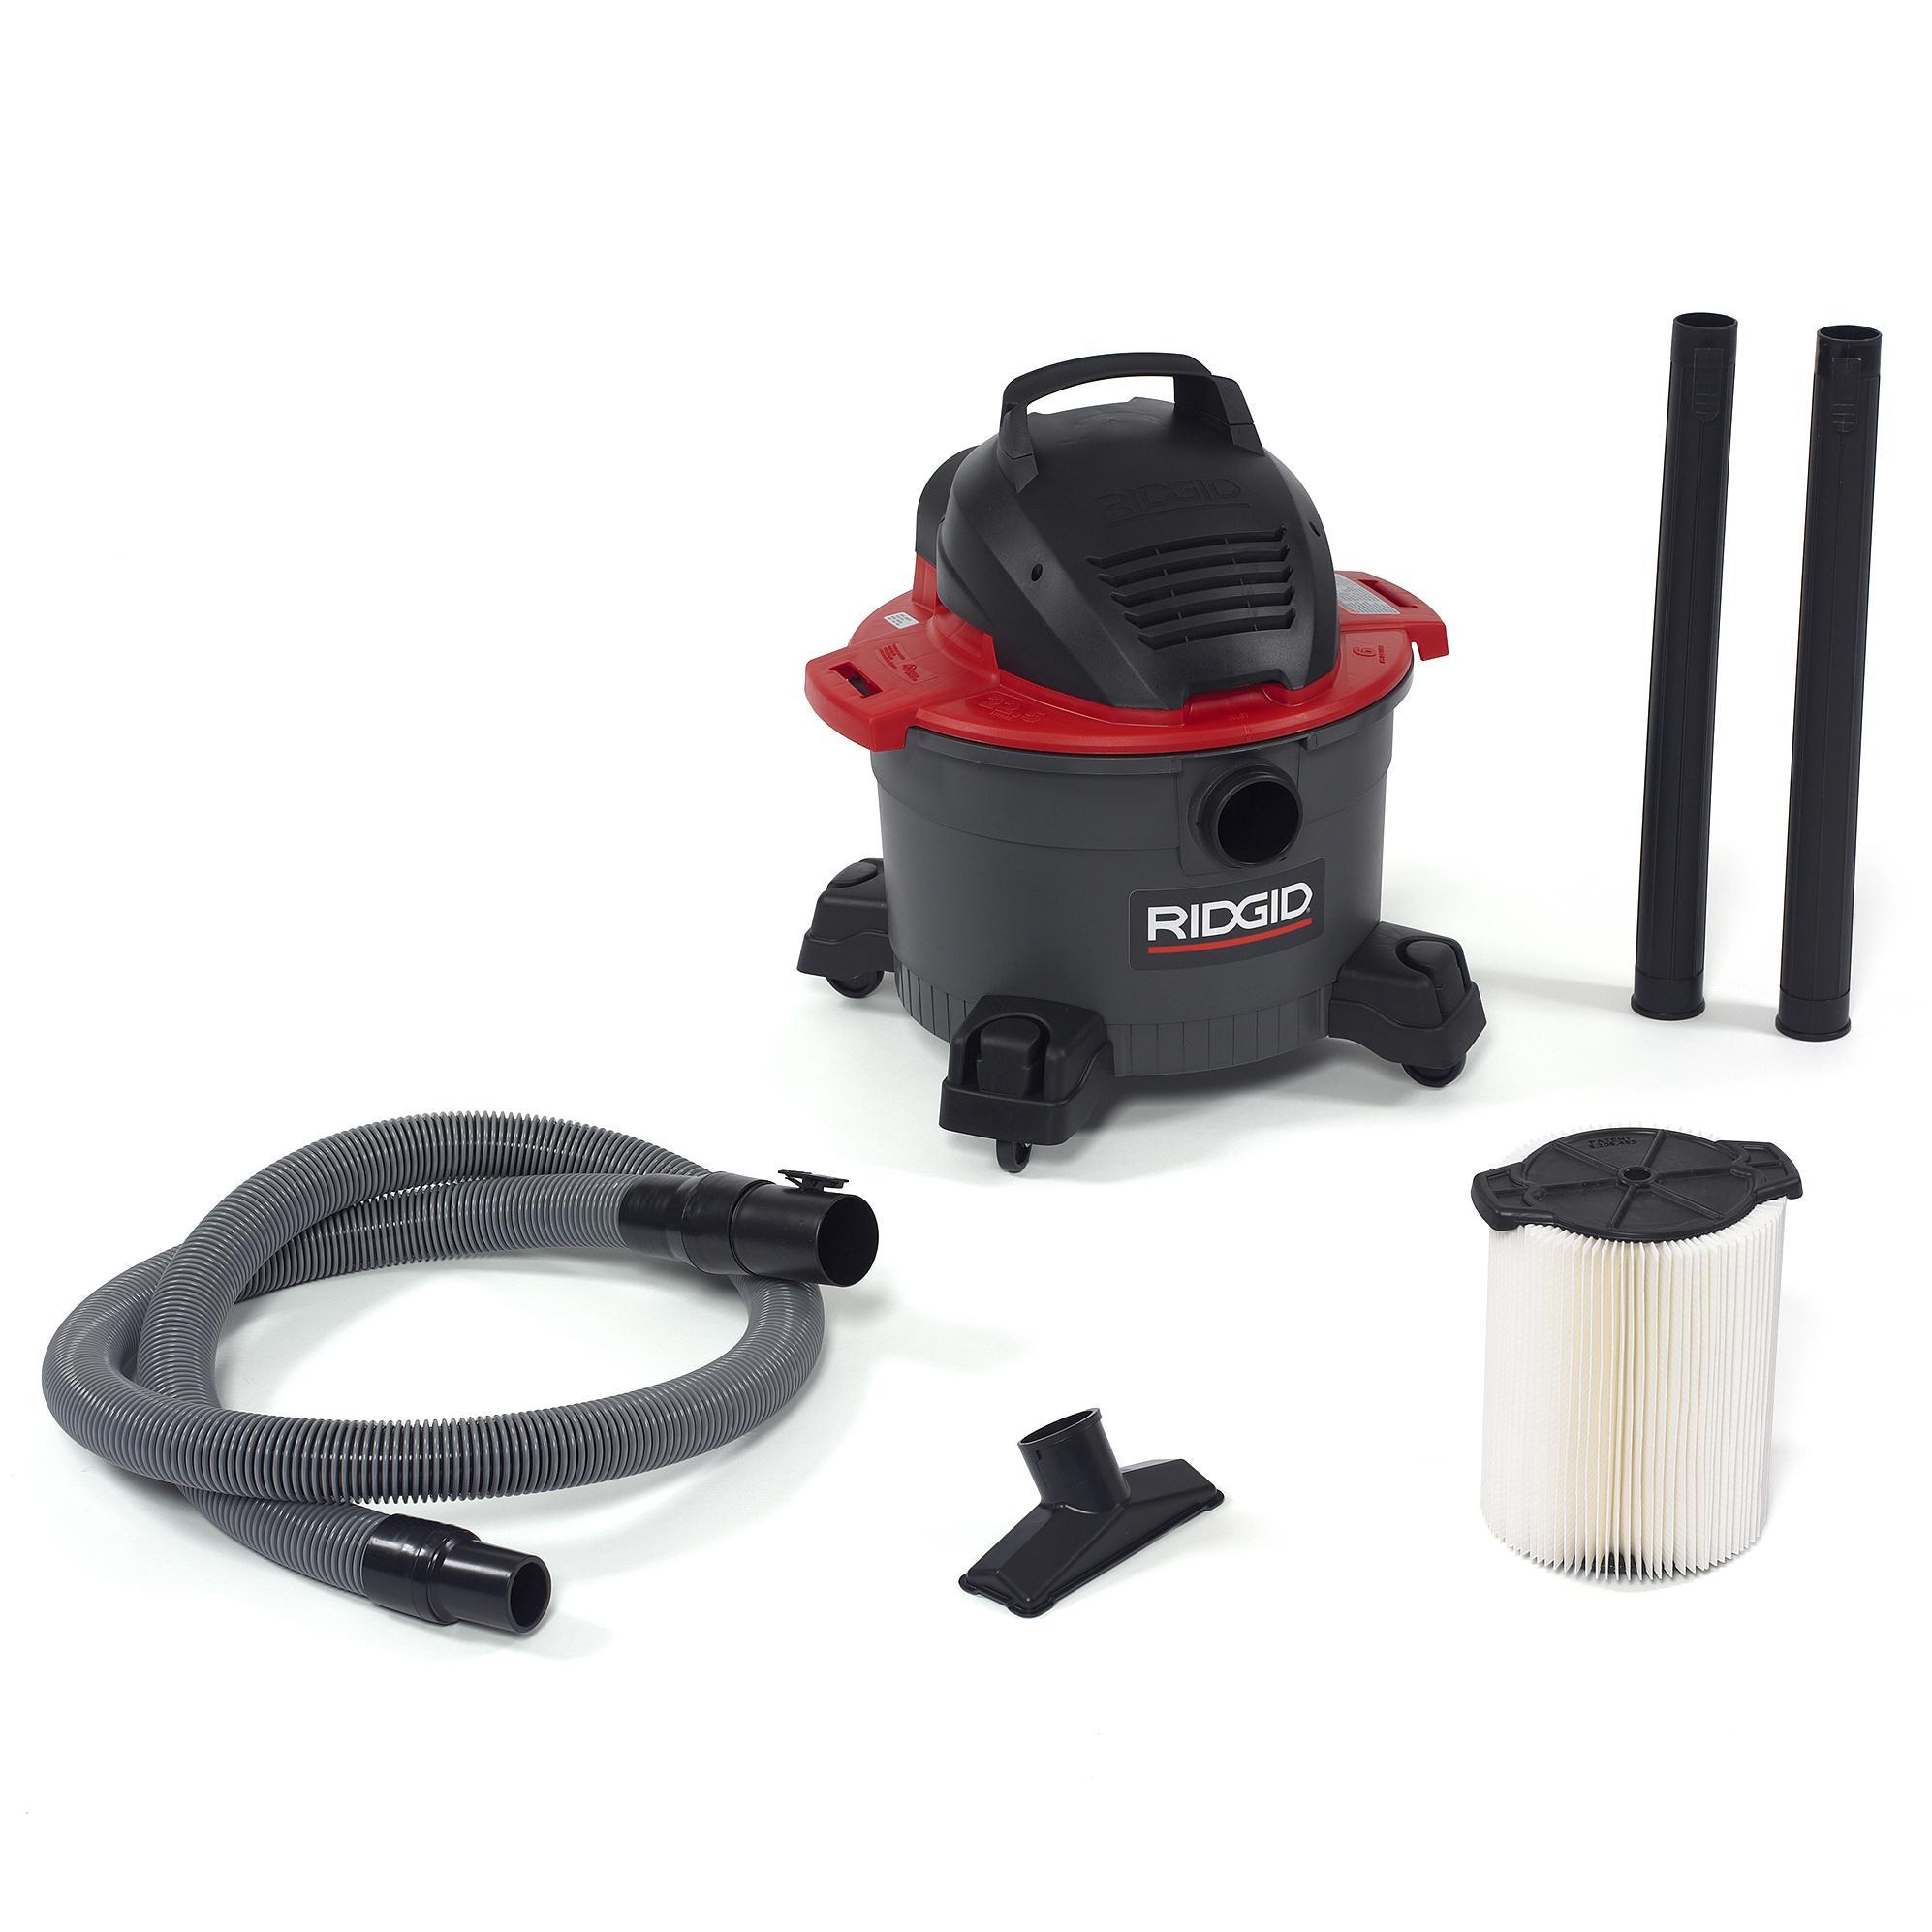 Ridgid Shop Vac Casters >> Ridgid 50308 Wet/Dry Vacuum, 6 gallon, Red: Amazon.ca: Tools & Home Improvement